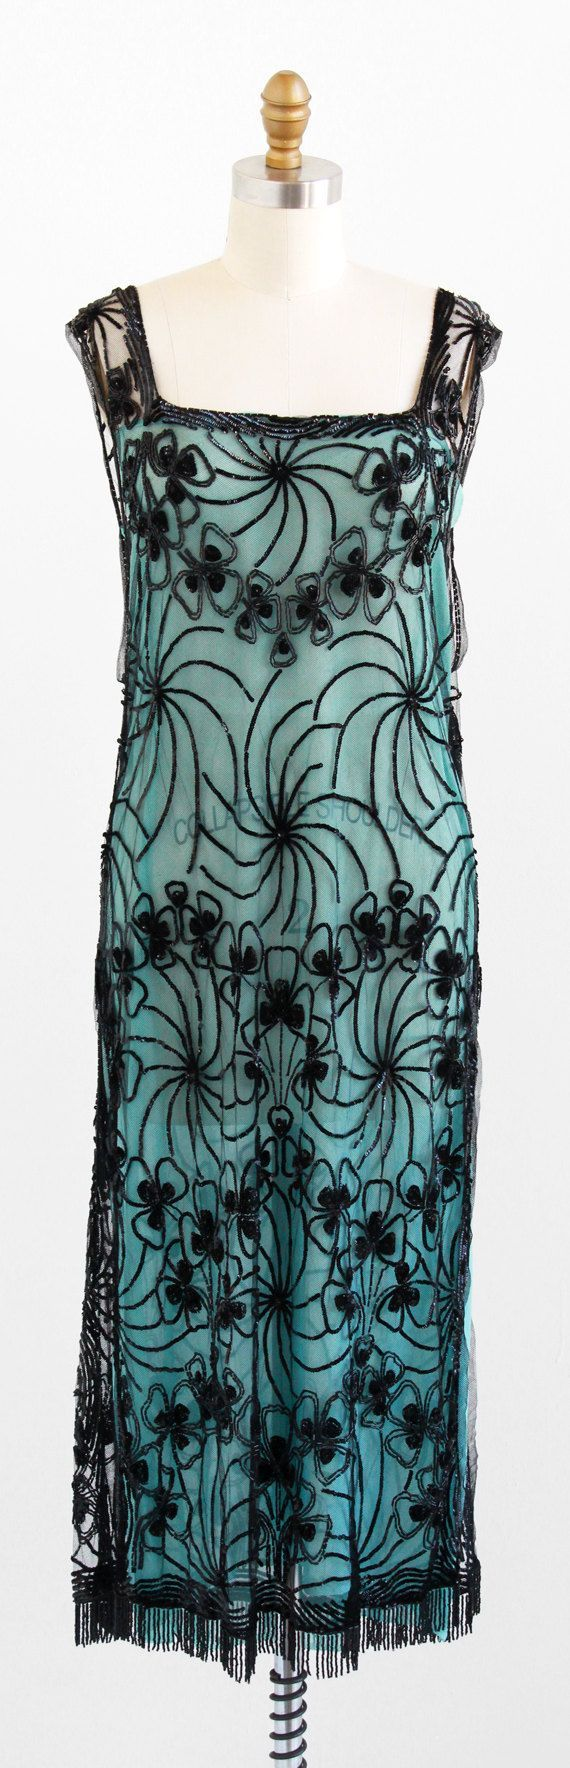 vintage 1920s black sequin tabard over mint chiffon ...